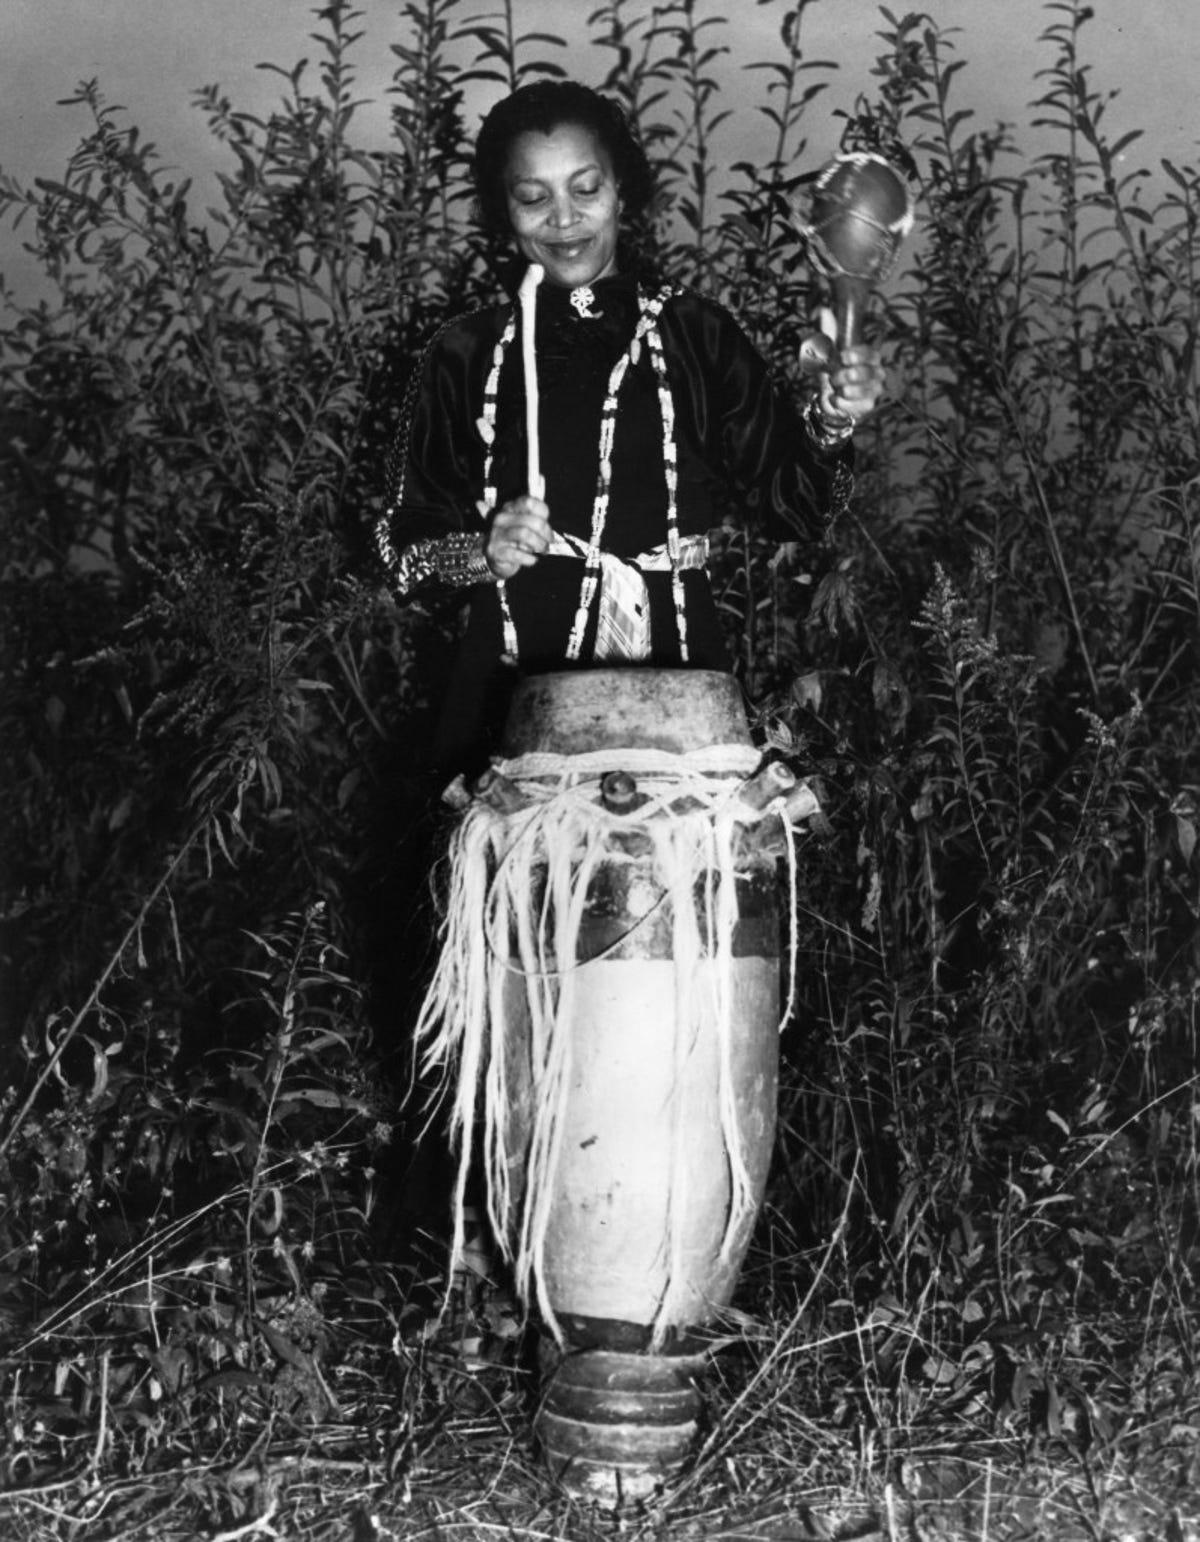 Florida Frontiers: Zora Neale Hurston and Voodoo